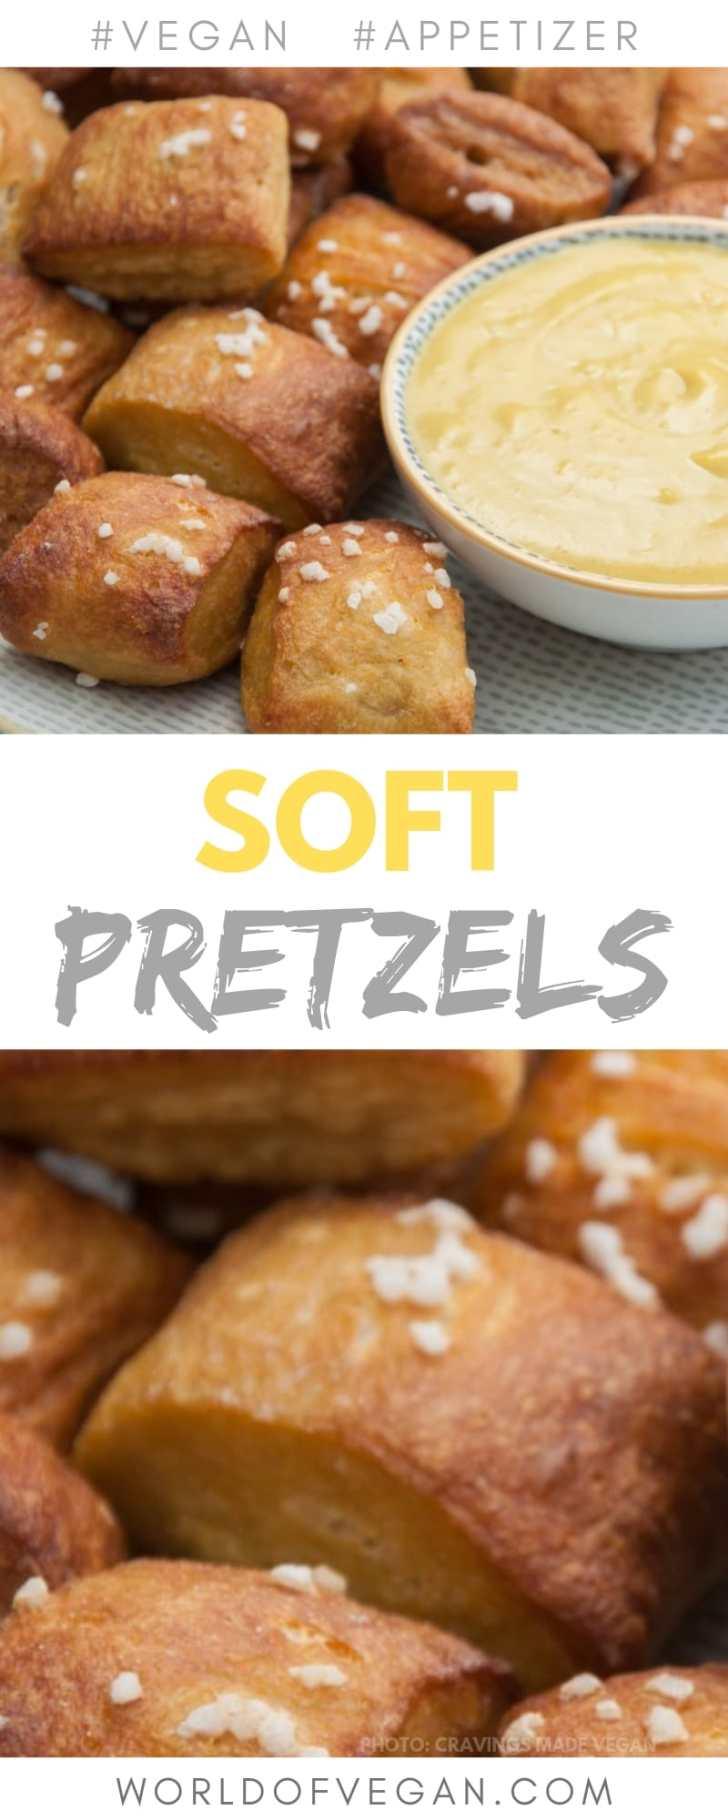 Vegan Soft Pretzels with Cheese Dip   Easy Appetizer Recipe   World of Vegan   #pretzels #cravings #snack #dip #cheese #worldofvegan